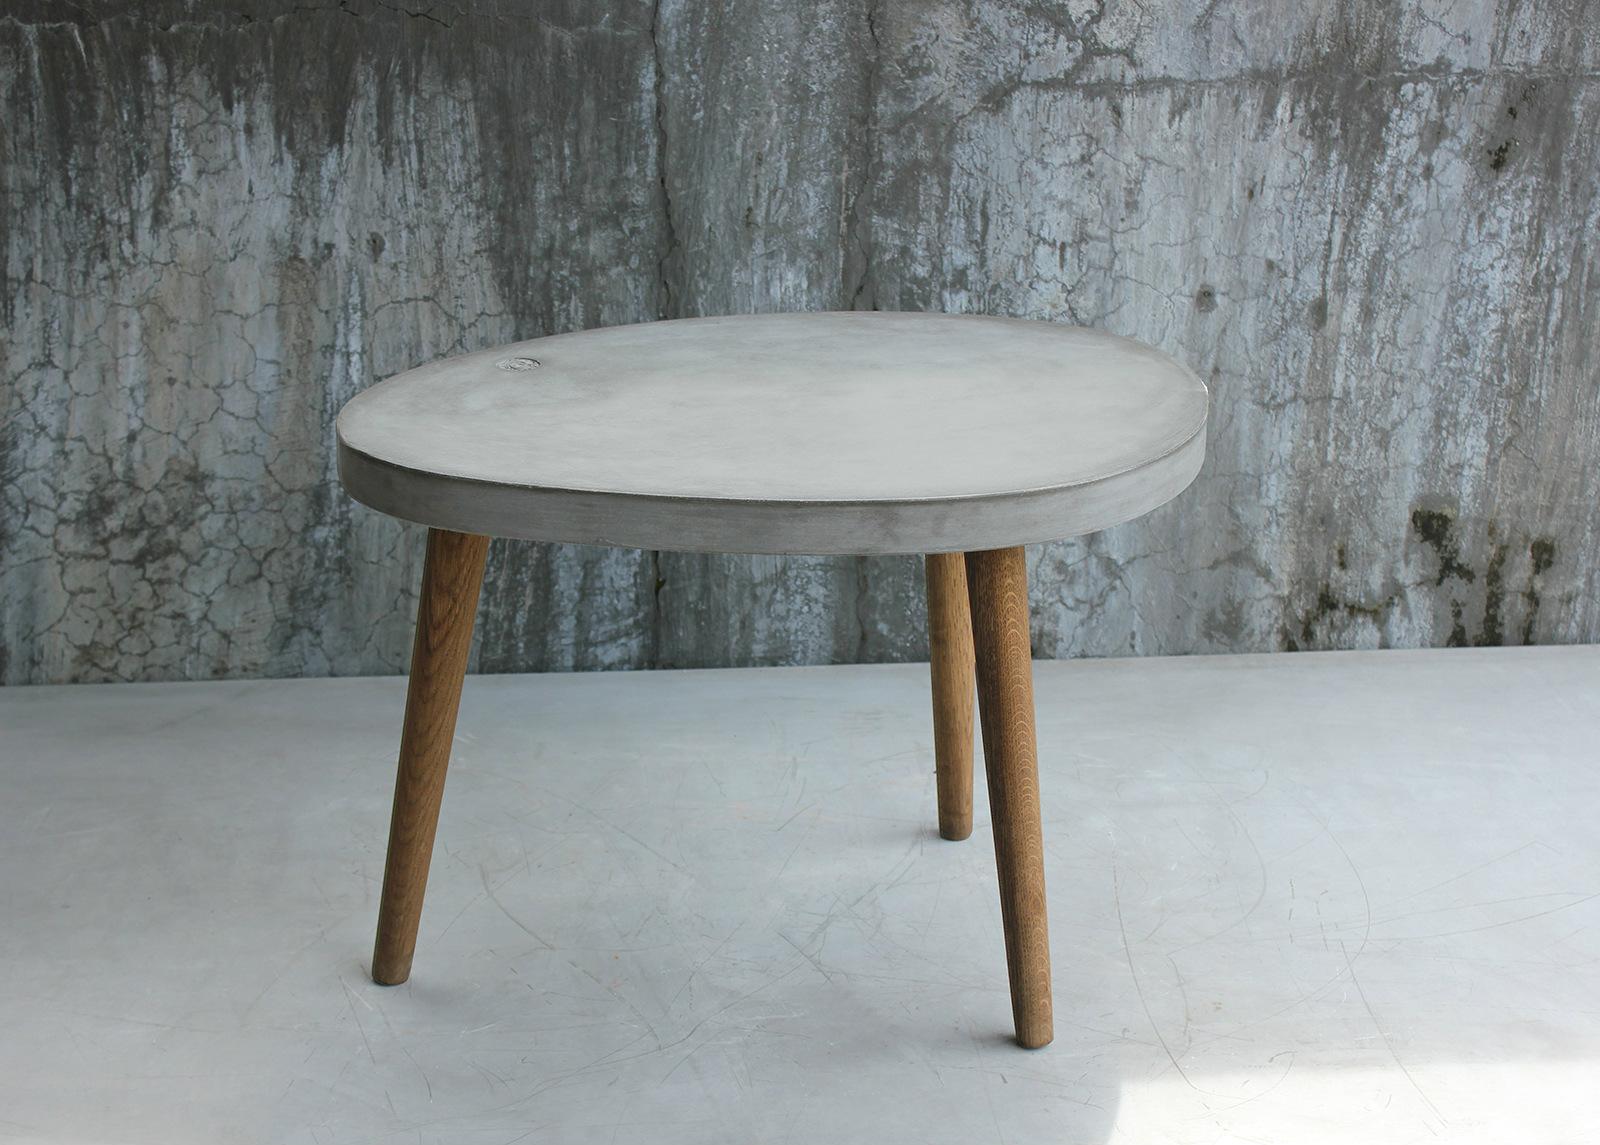 Sohvapöytä TOM TAILOR CEMENT 75x52 cm